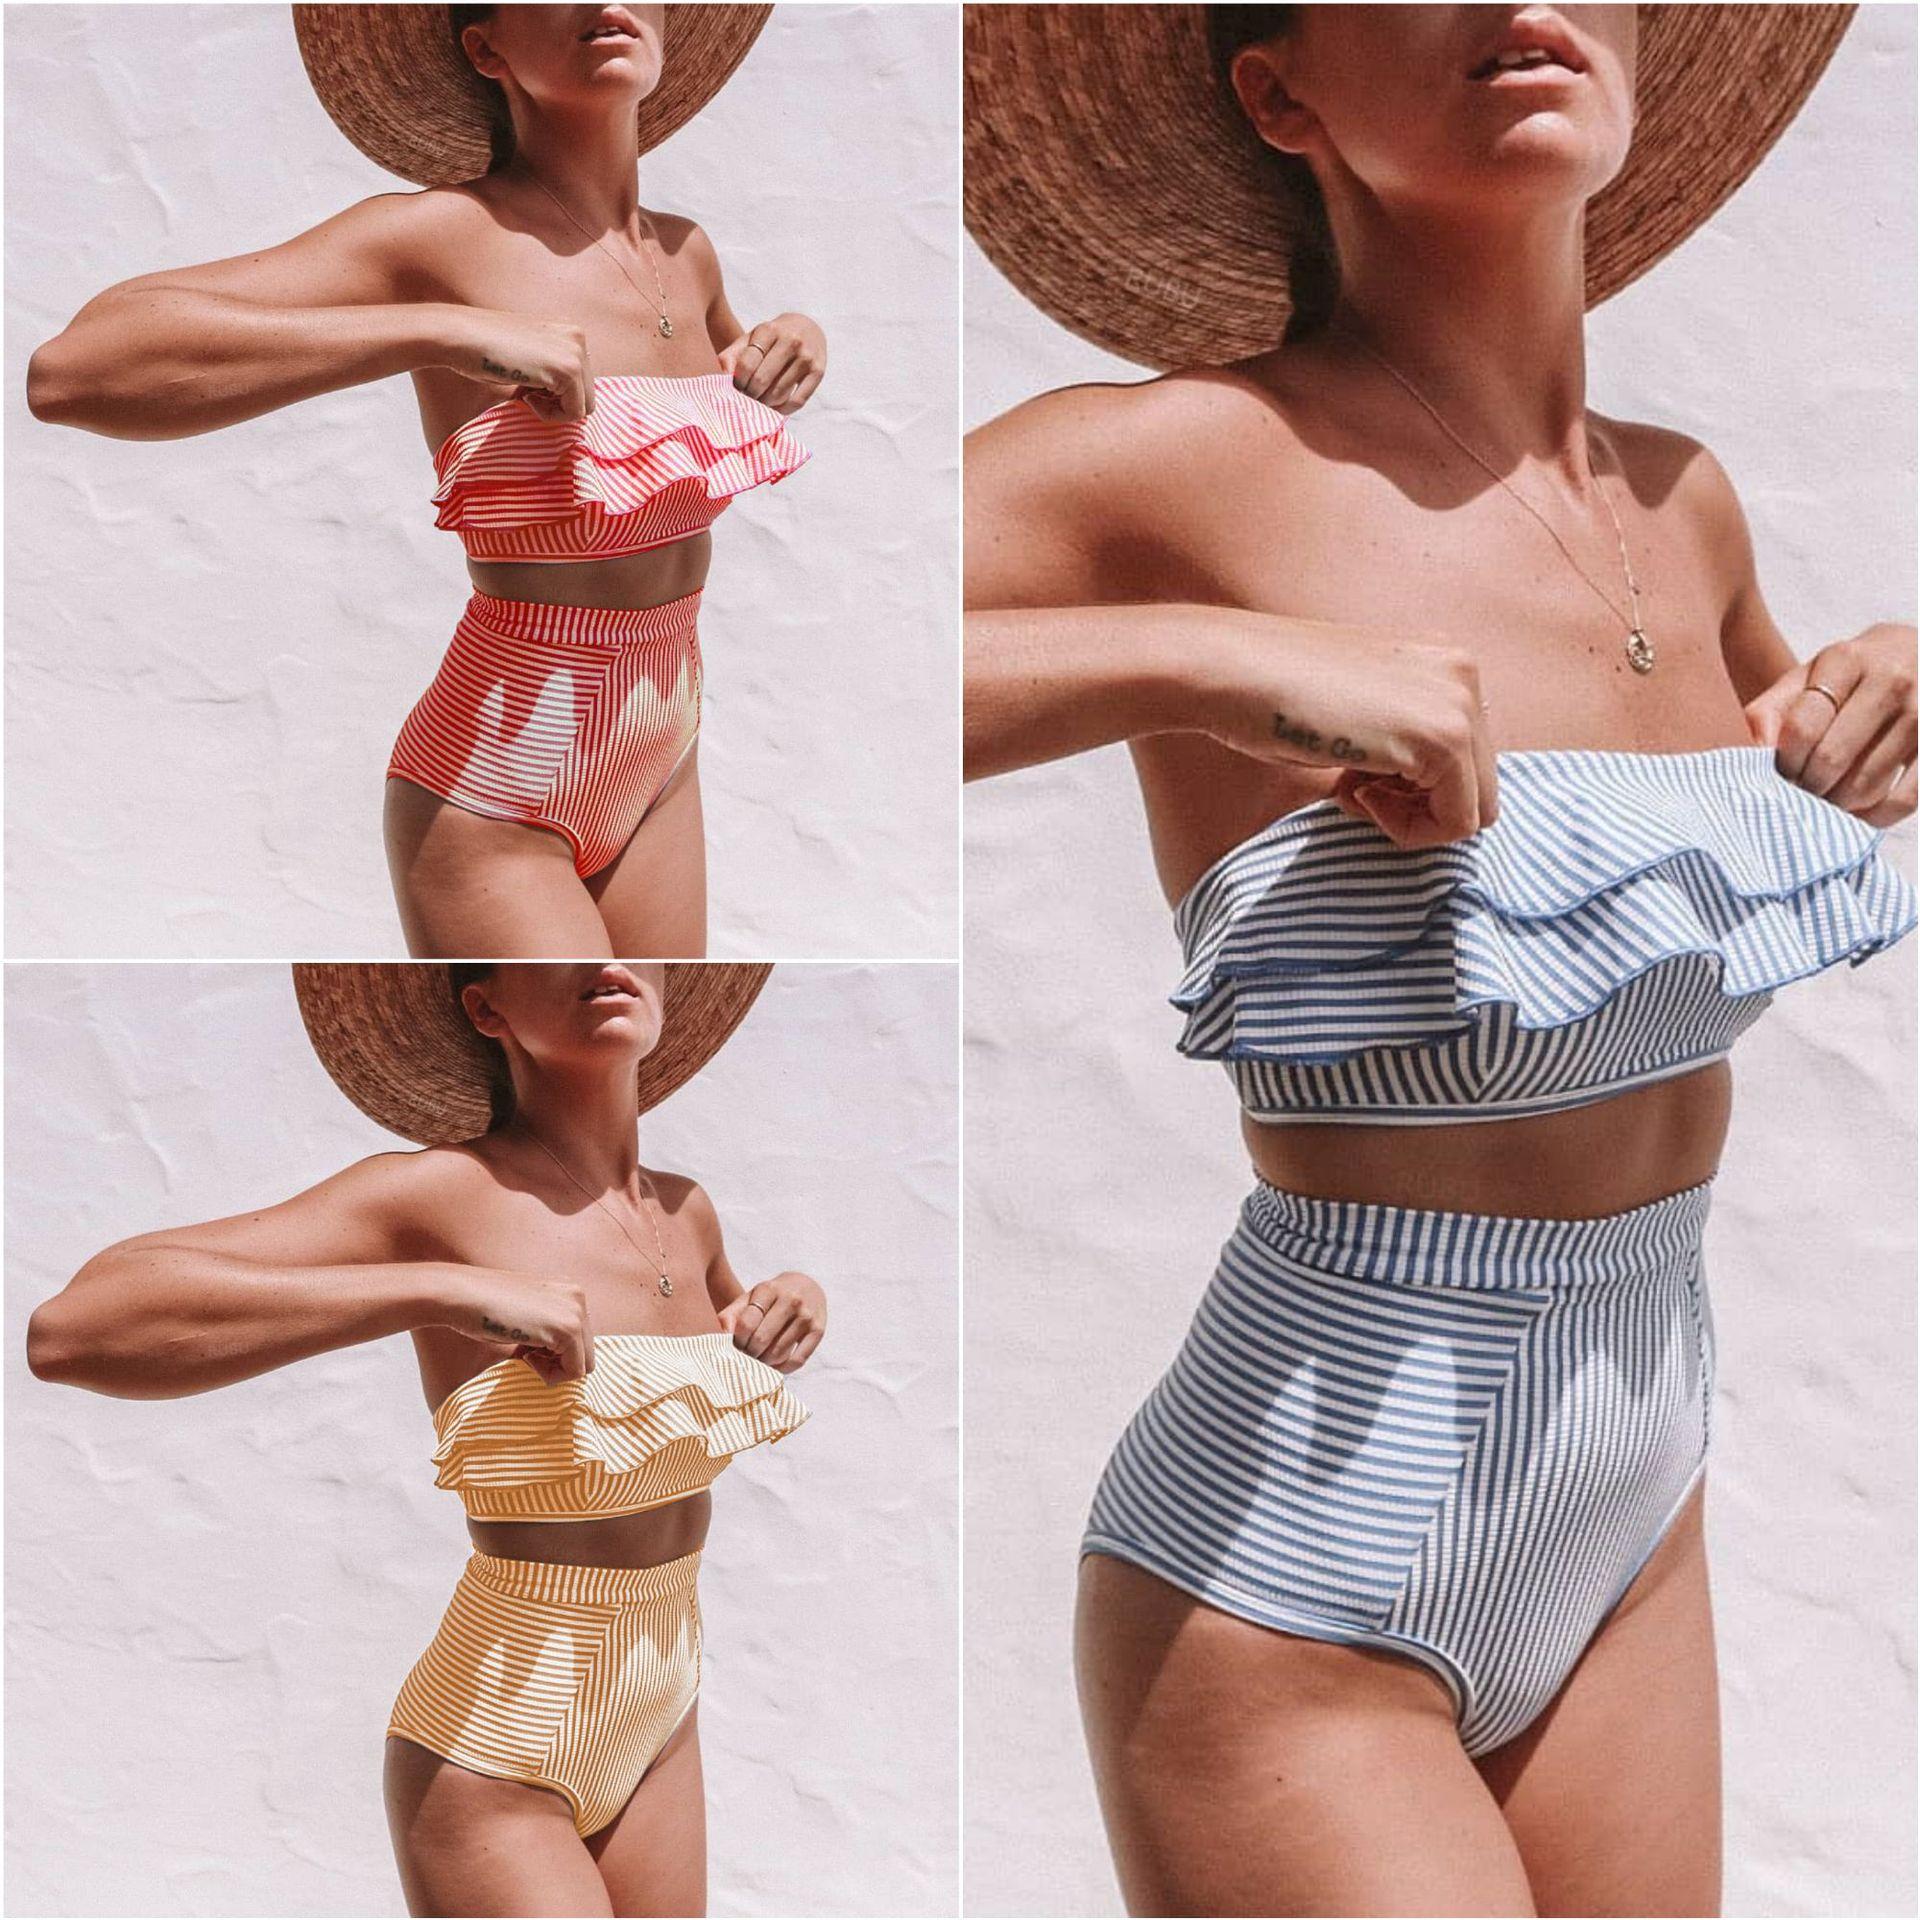 Sexy Brazilian Bikini Set Women Solid High Cut Bathing Suit Swimwear Summer Beach Wear Female Low Waist Red Swimsuit Biquini in Bikinis Set from Sports Entertainment